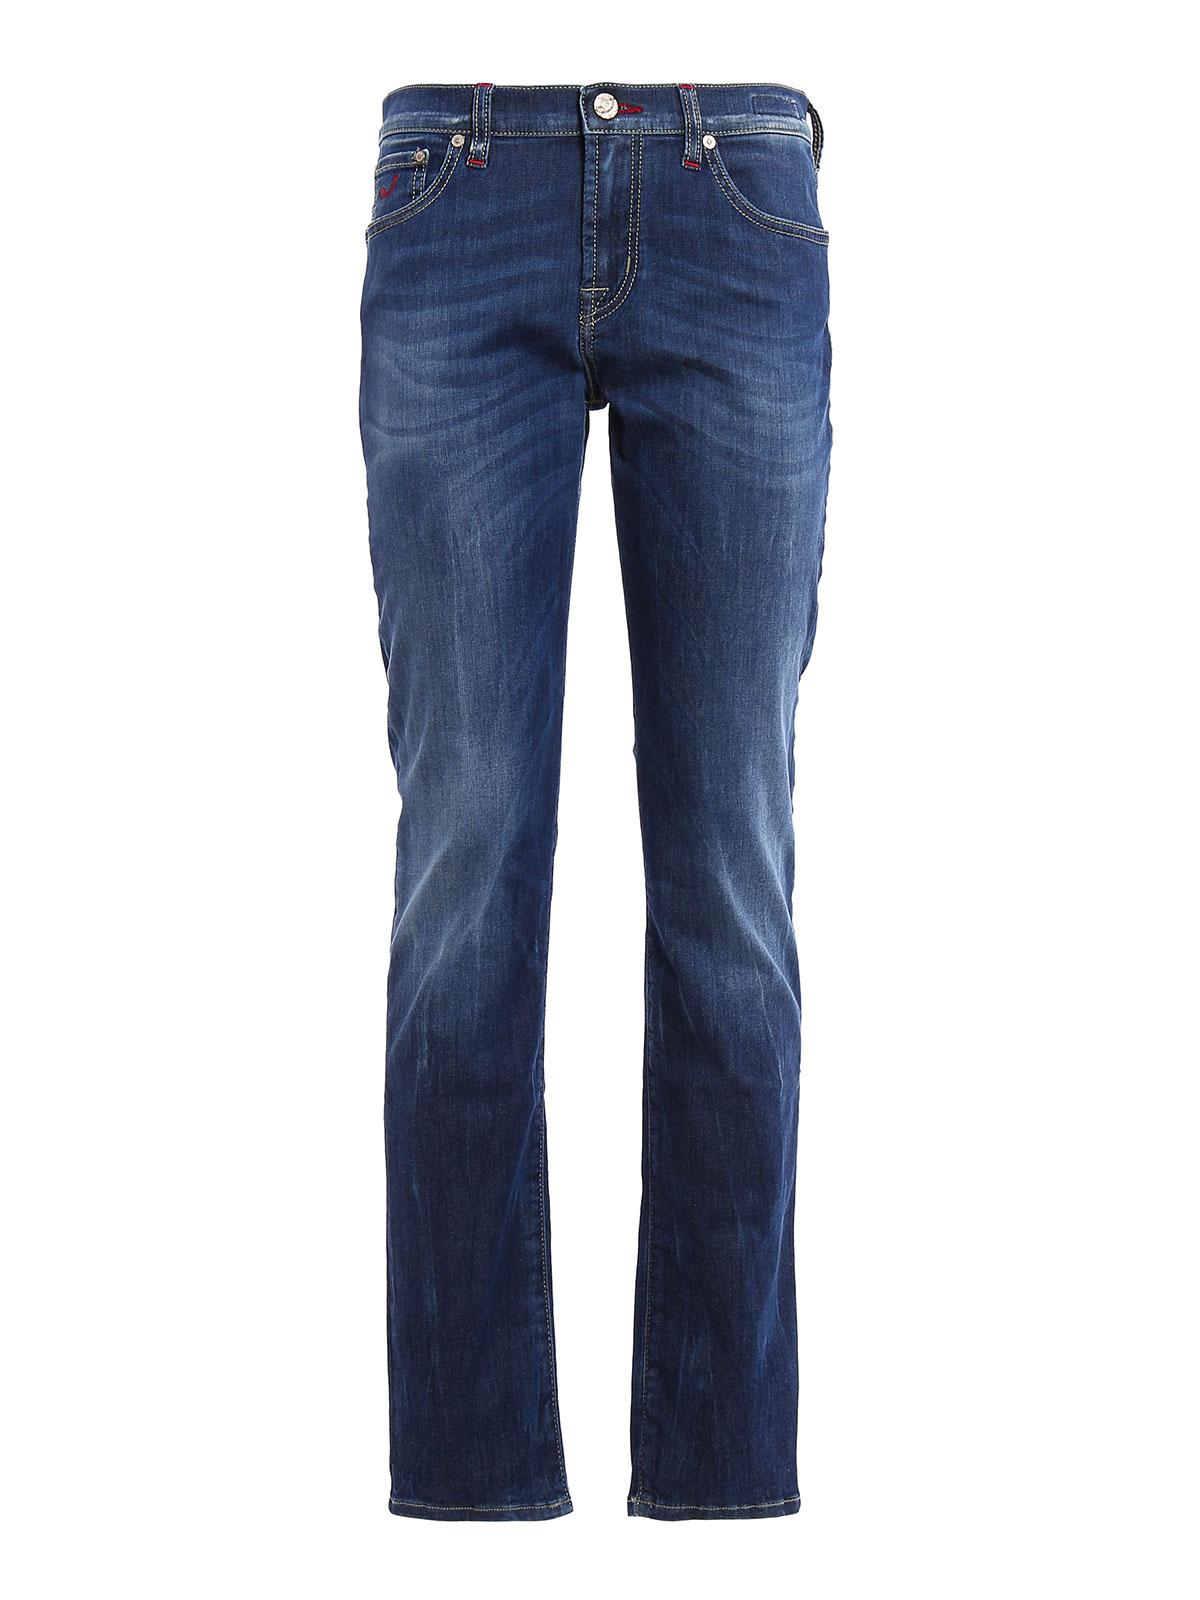 Kimberly jeans by jacob cohen skinny jeans ikrix - Jacob cohen denim ...